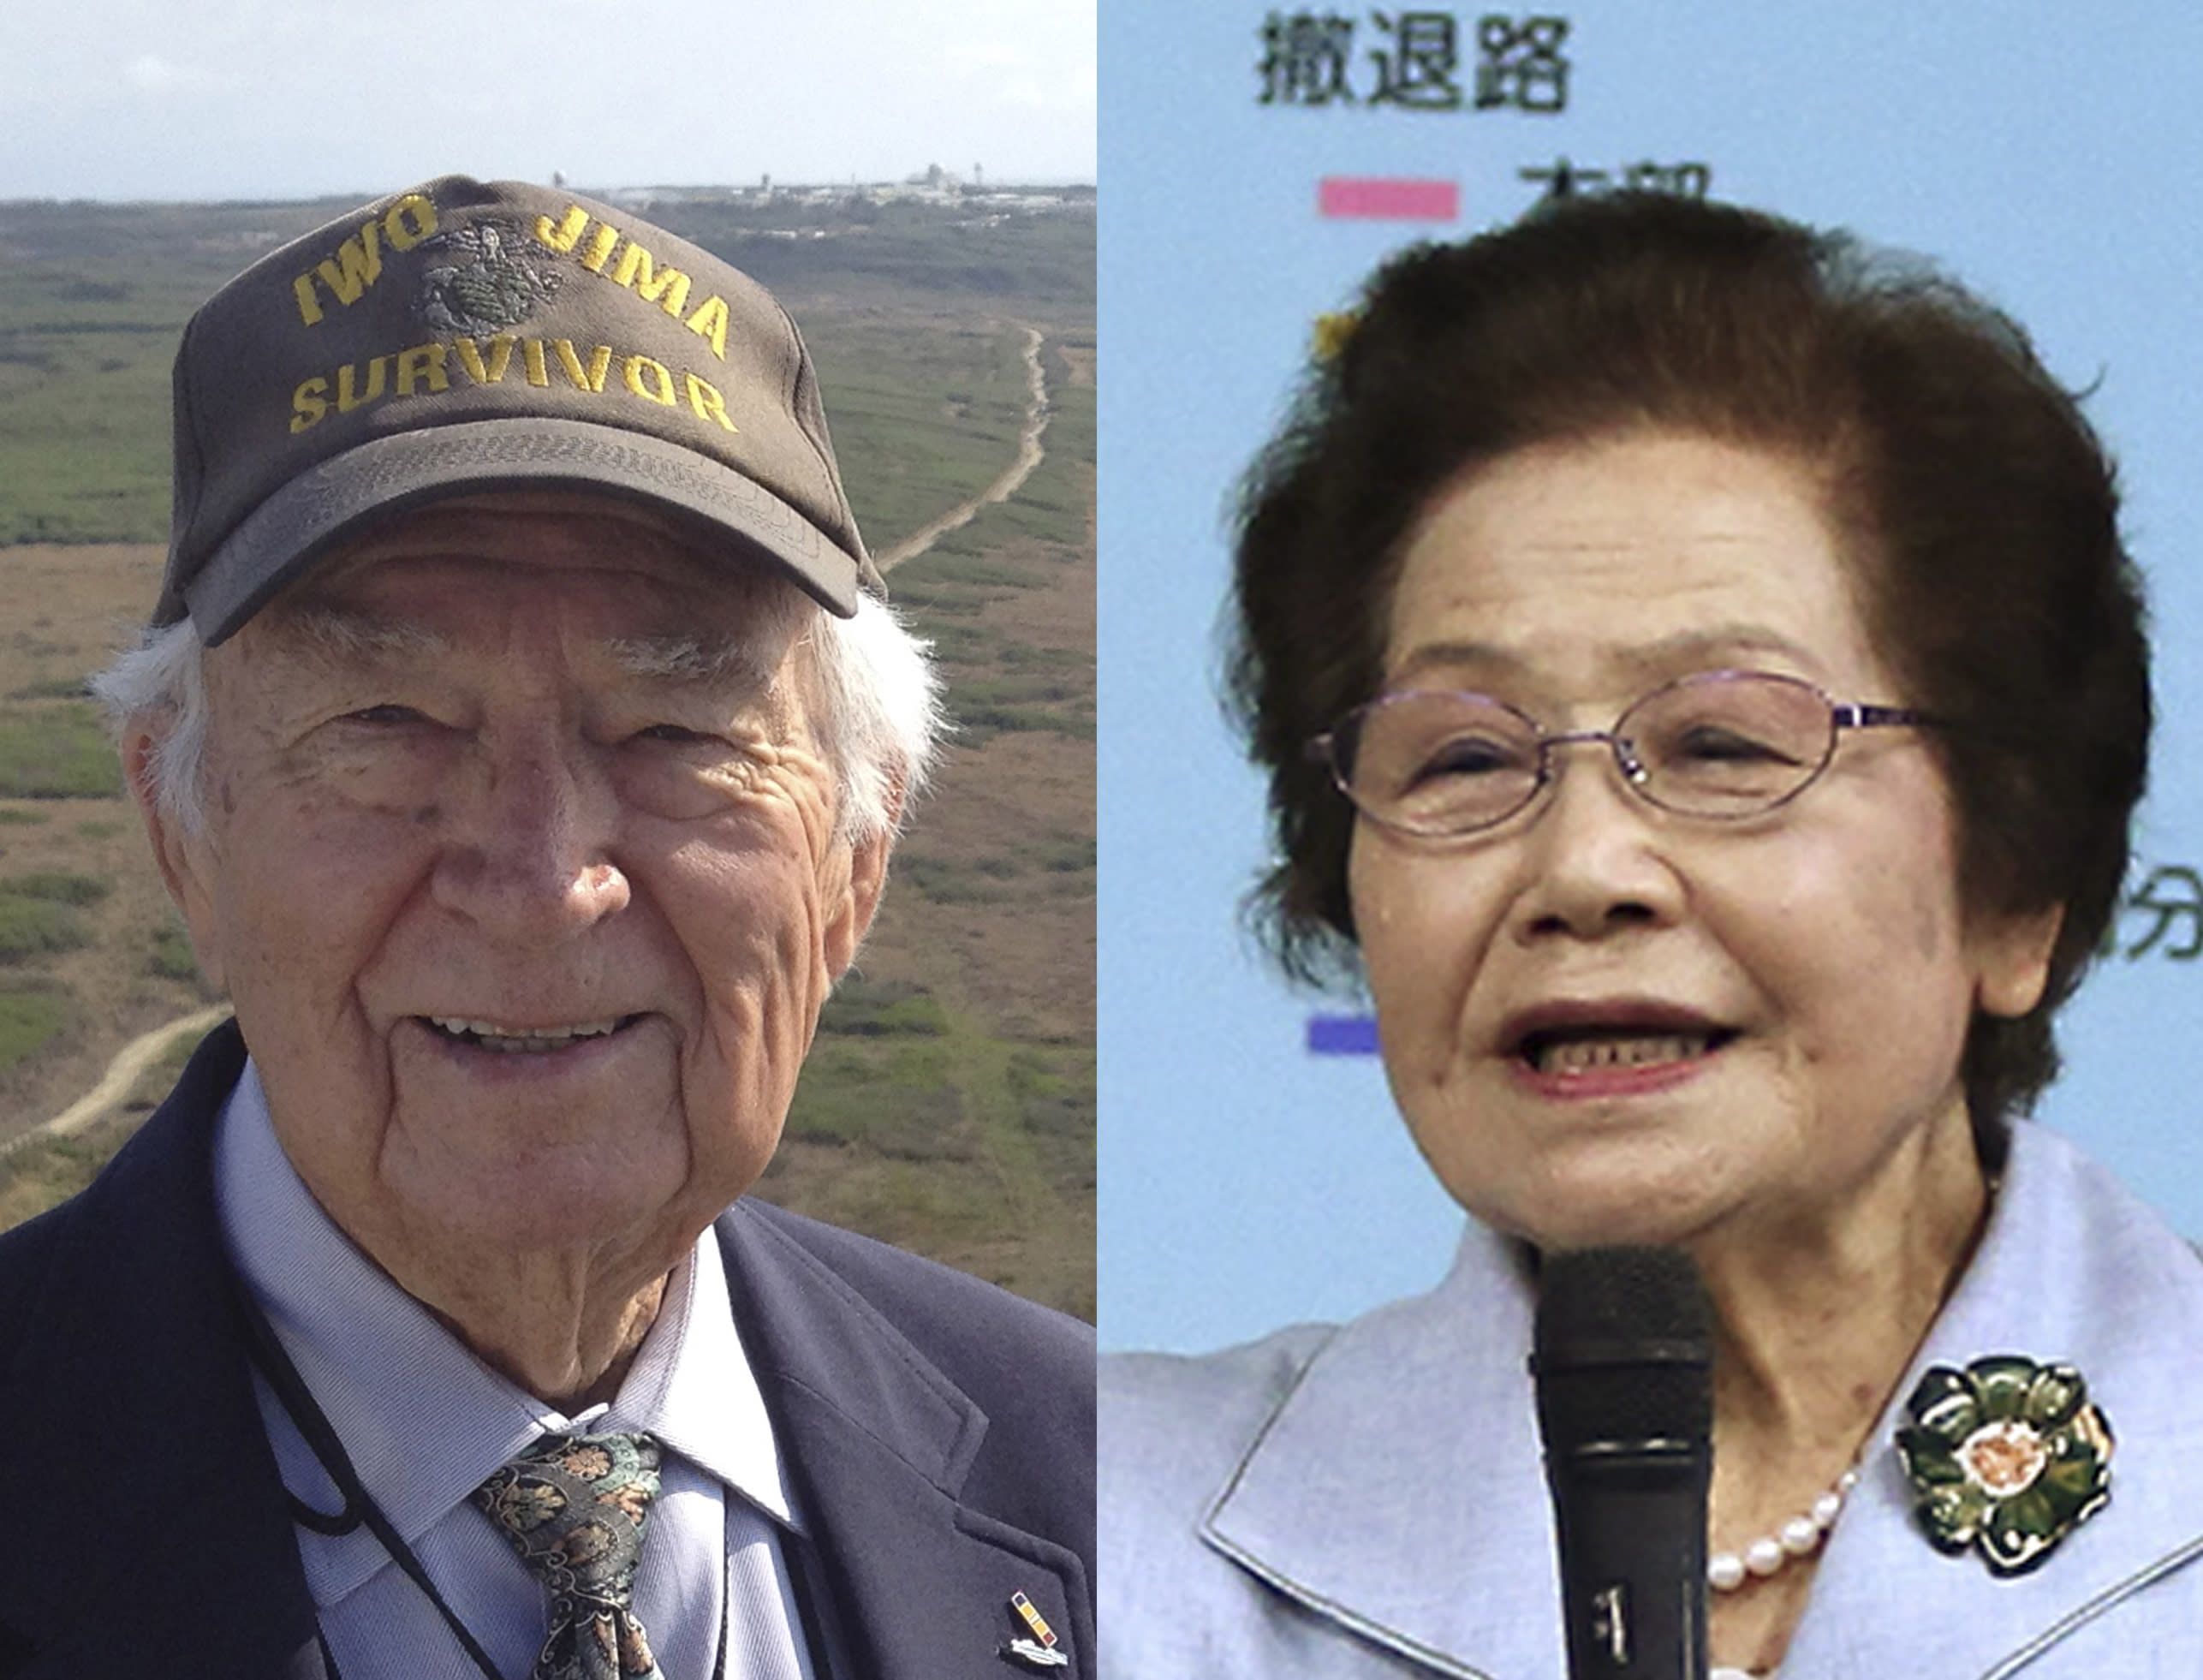 Iwo Jima vet, Okinawa survivor wrestle with WWII legacy